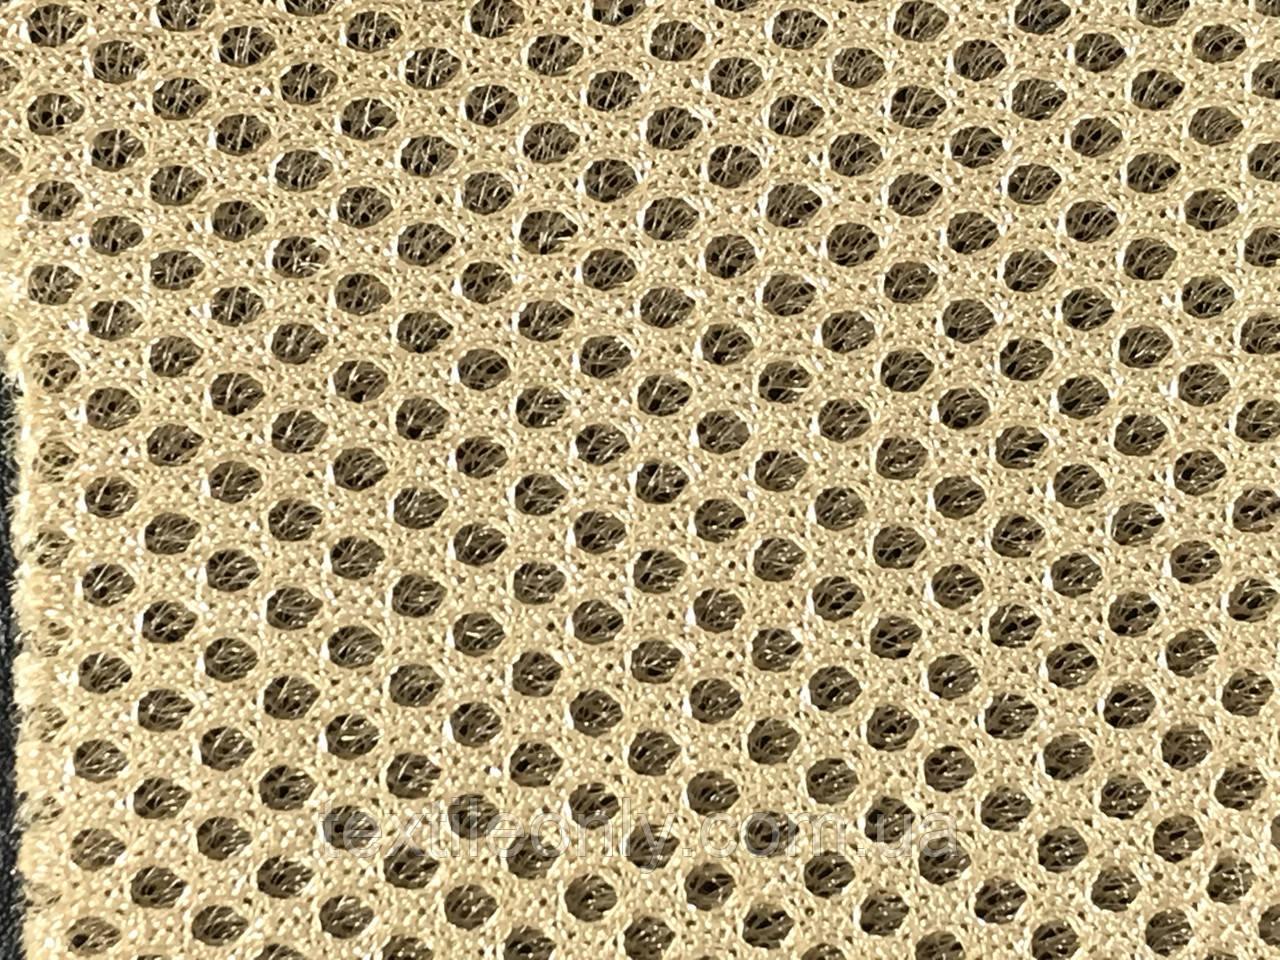 Сетка сумочно-обувная на поролоне артекс (airtex) цвет бежевый